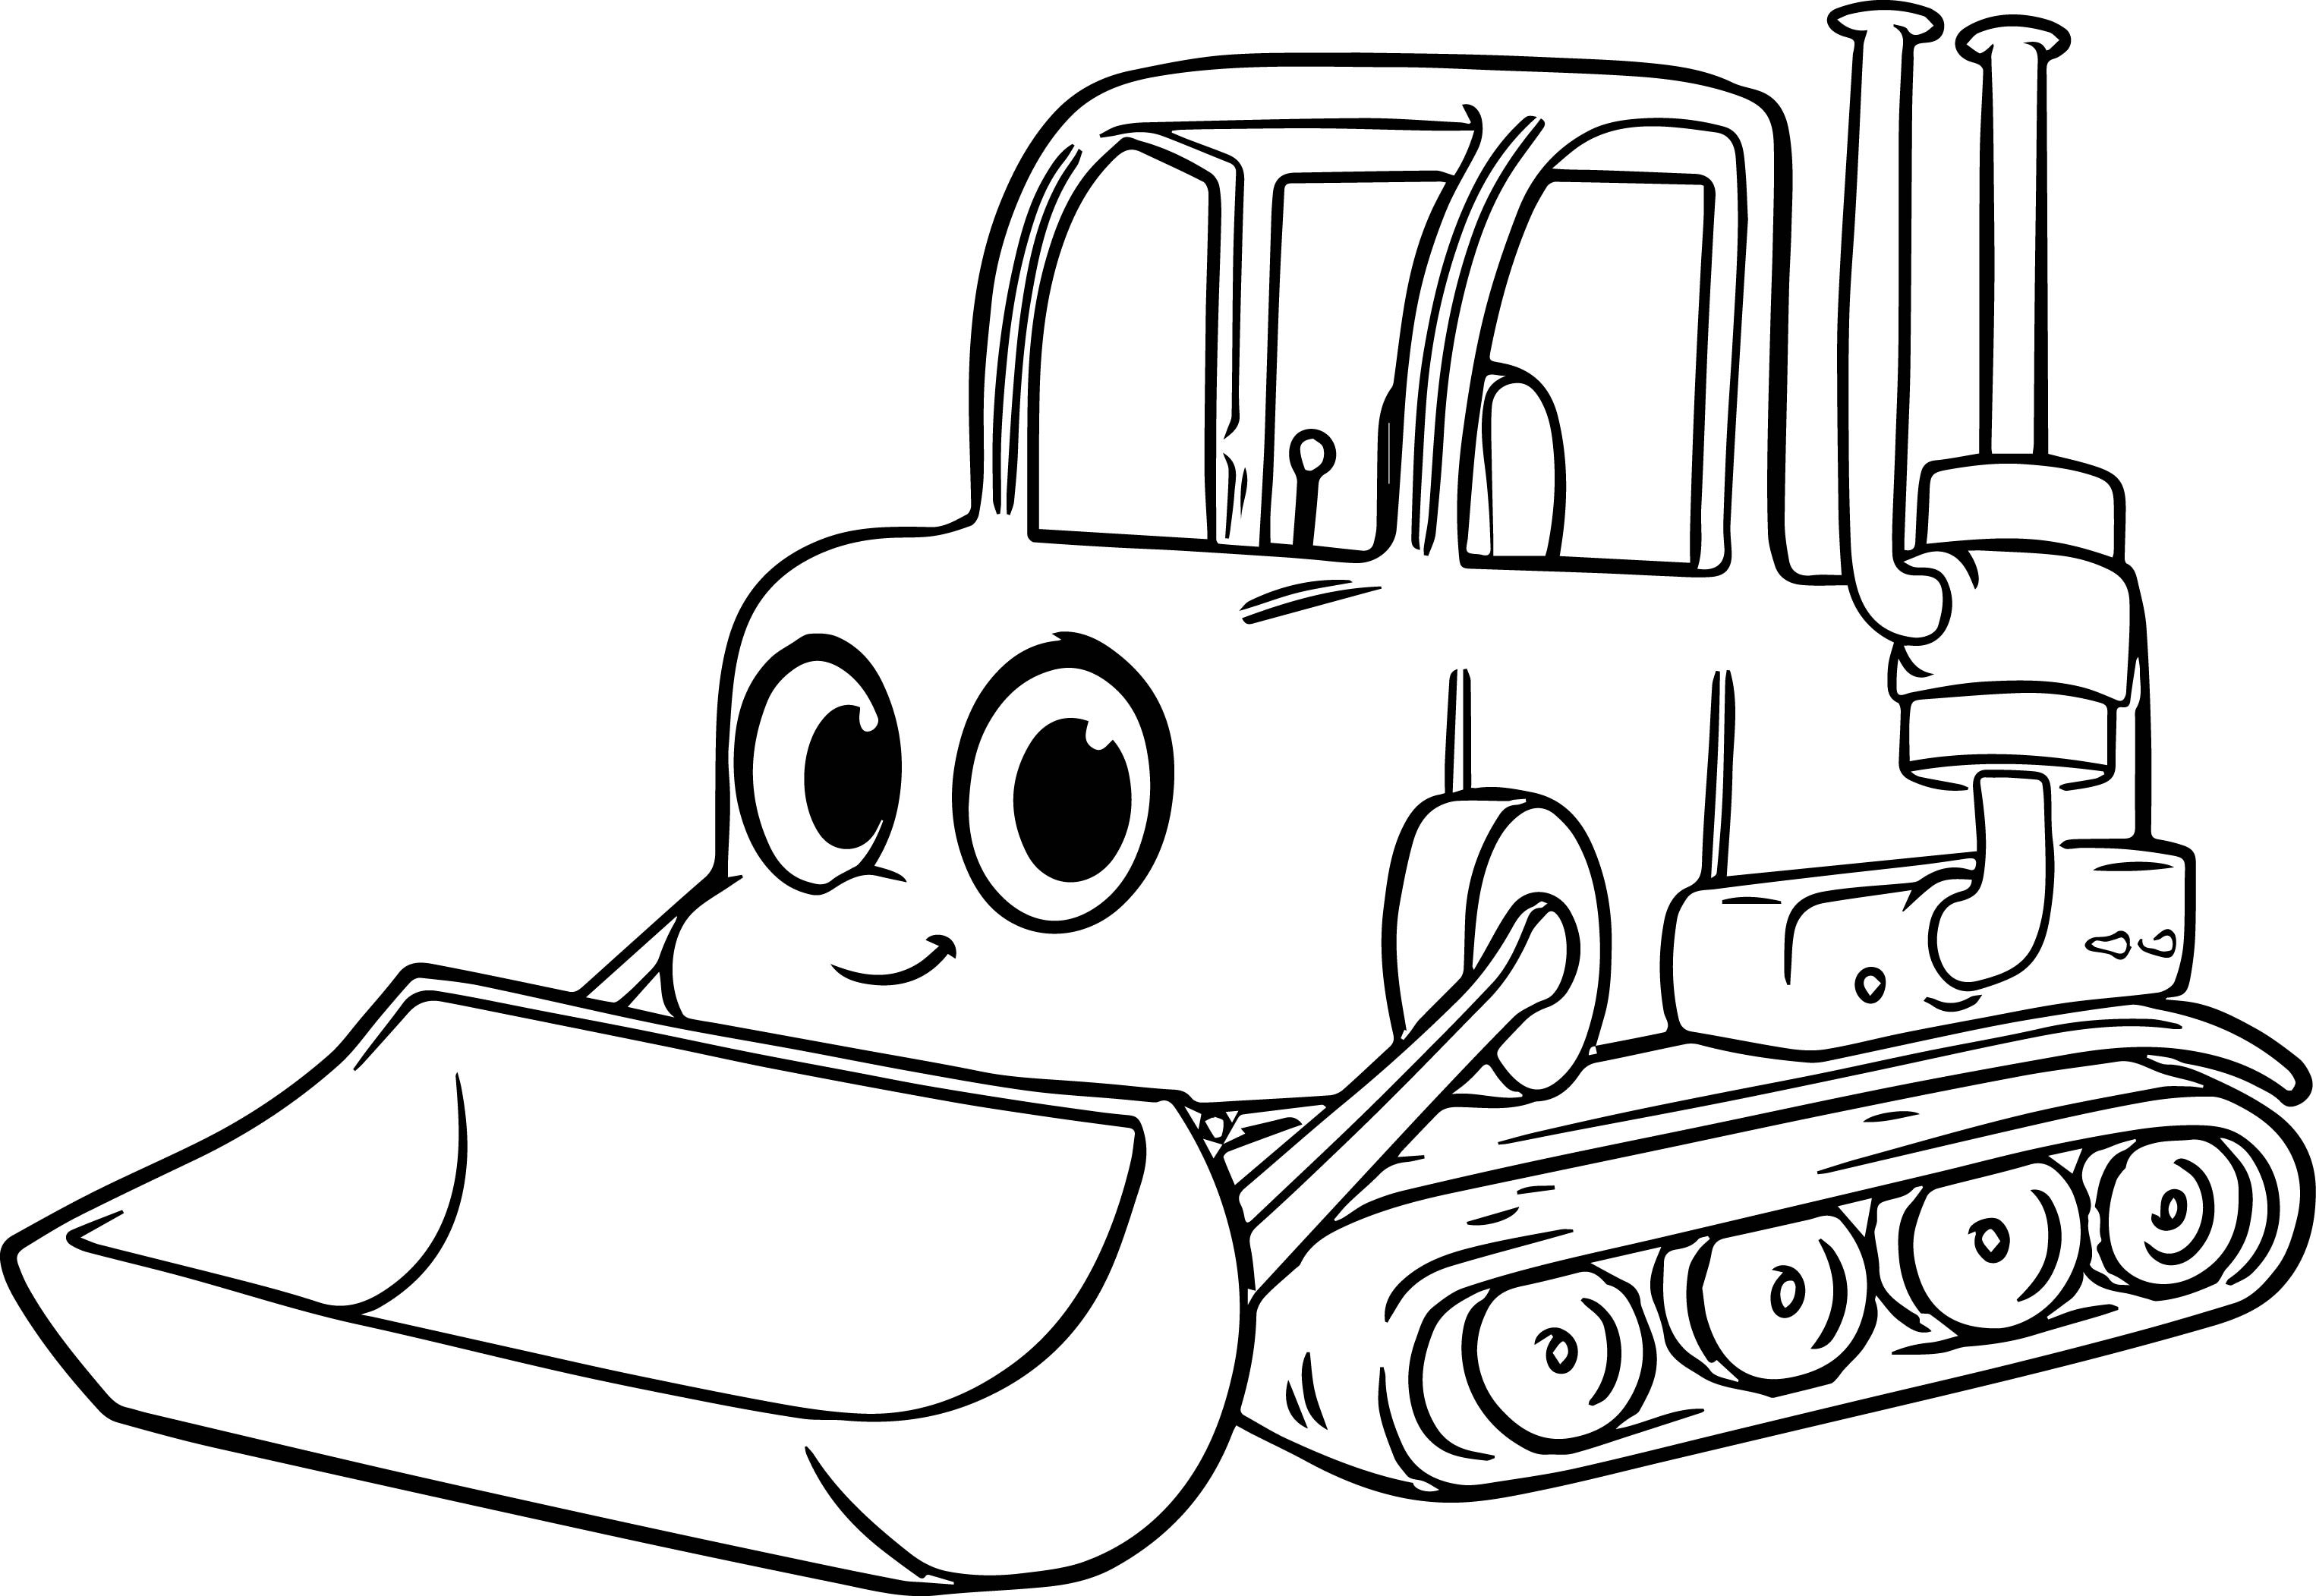 bulldozer pictures to color manny bulldozer coloring page wecoloringpagecom to pictures bulldozer color